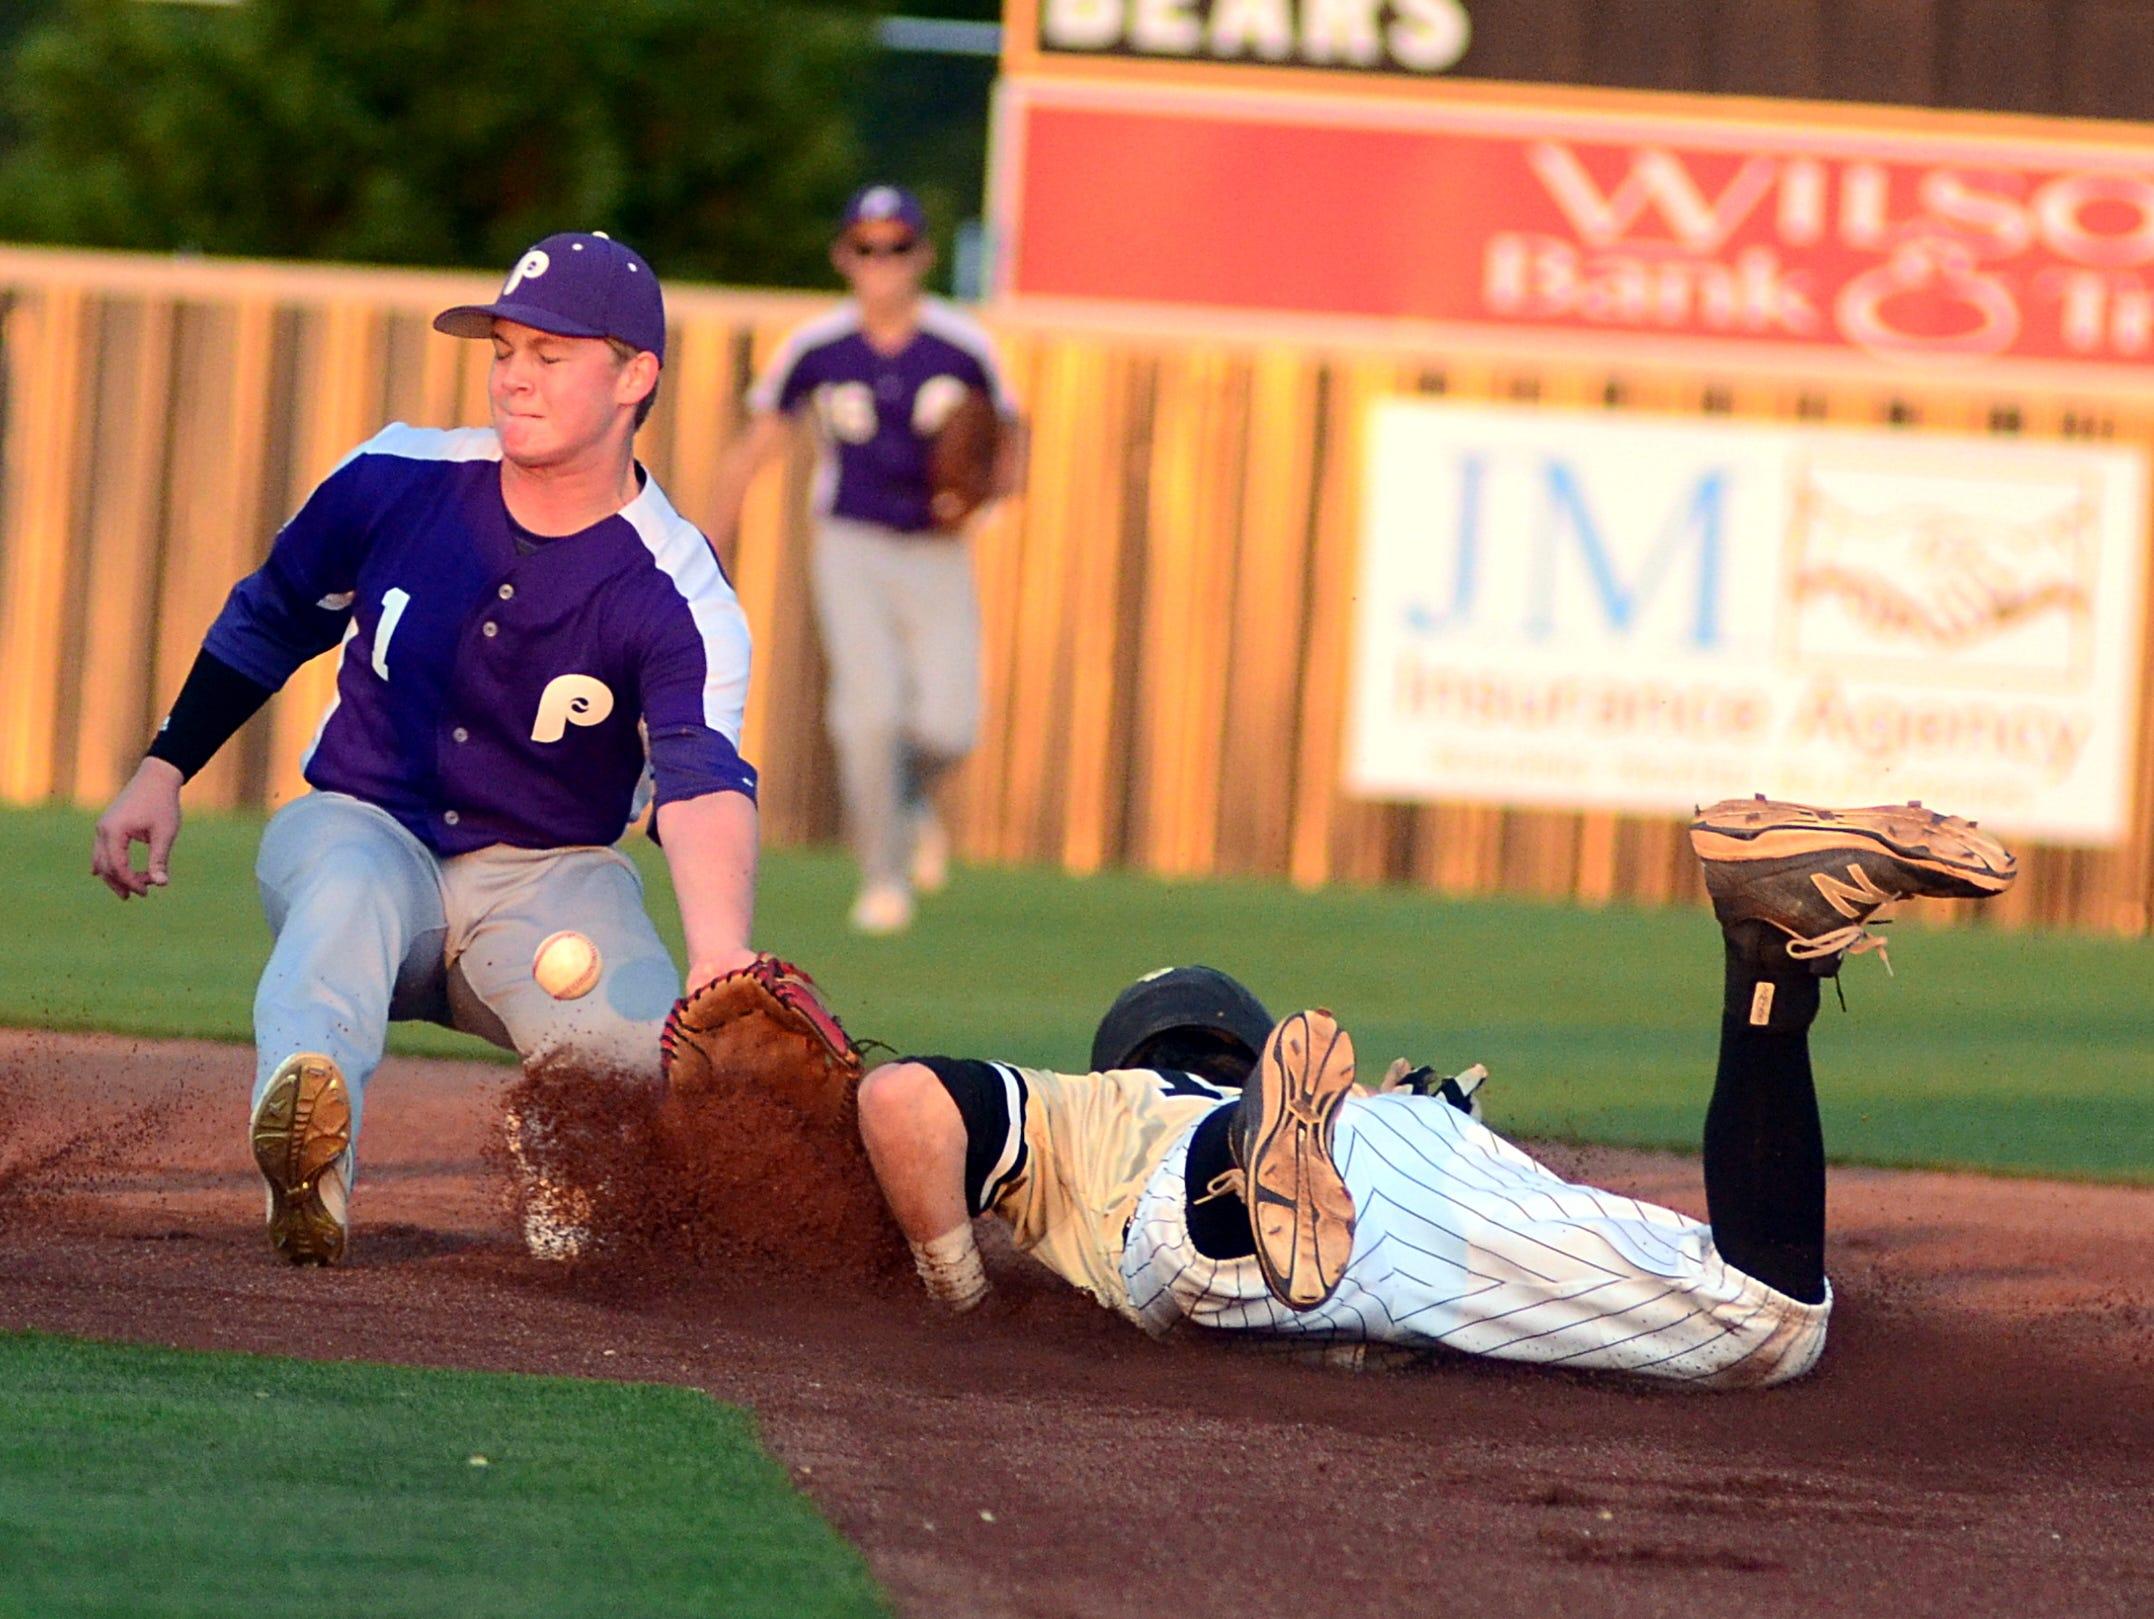 Portland High freshman shortstop Brandon Tucker receives a throw as Mt. Juliet junior Aaron Brown steals second base during first-inning action.